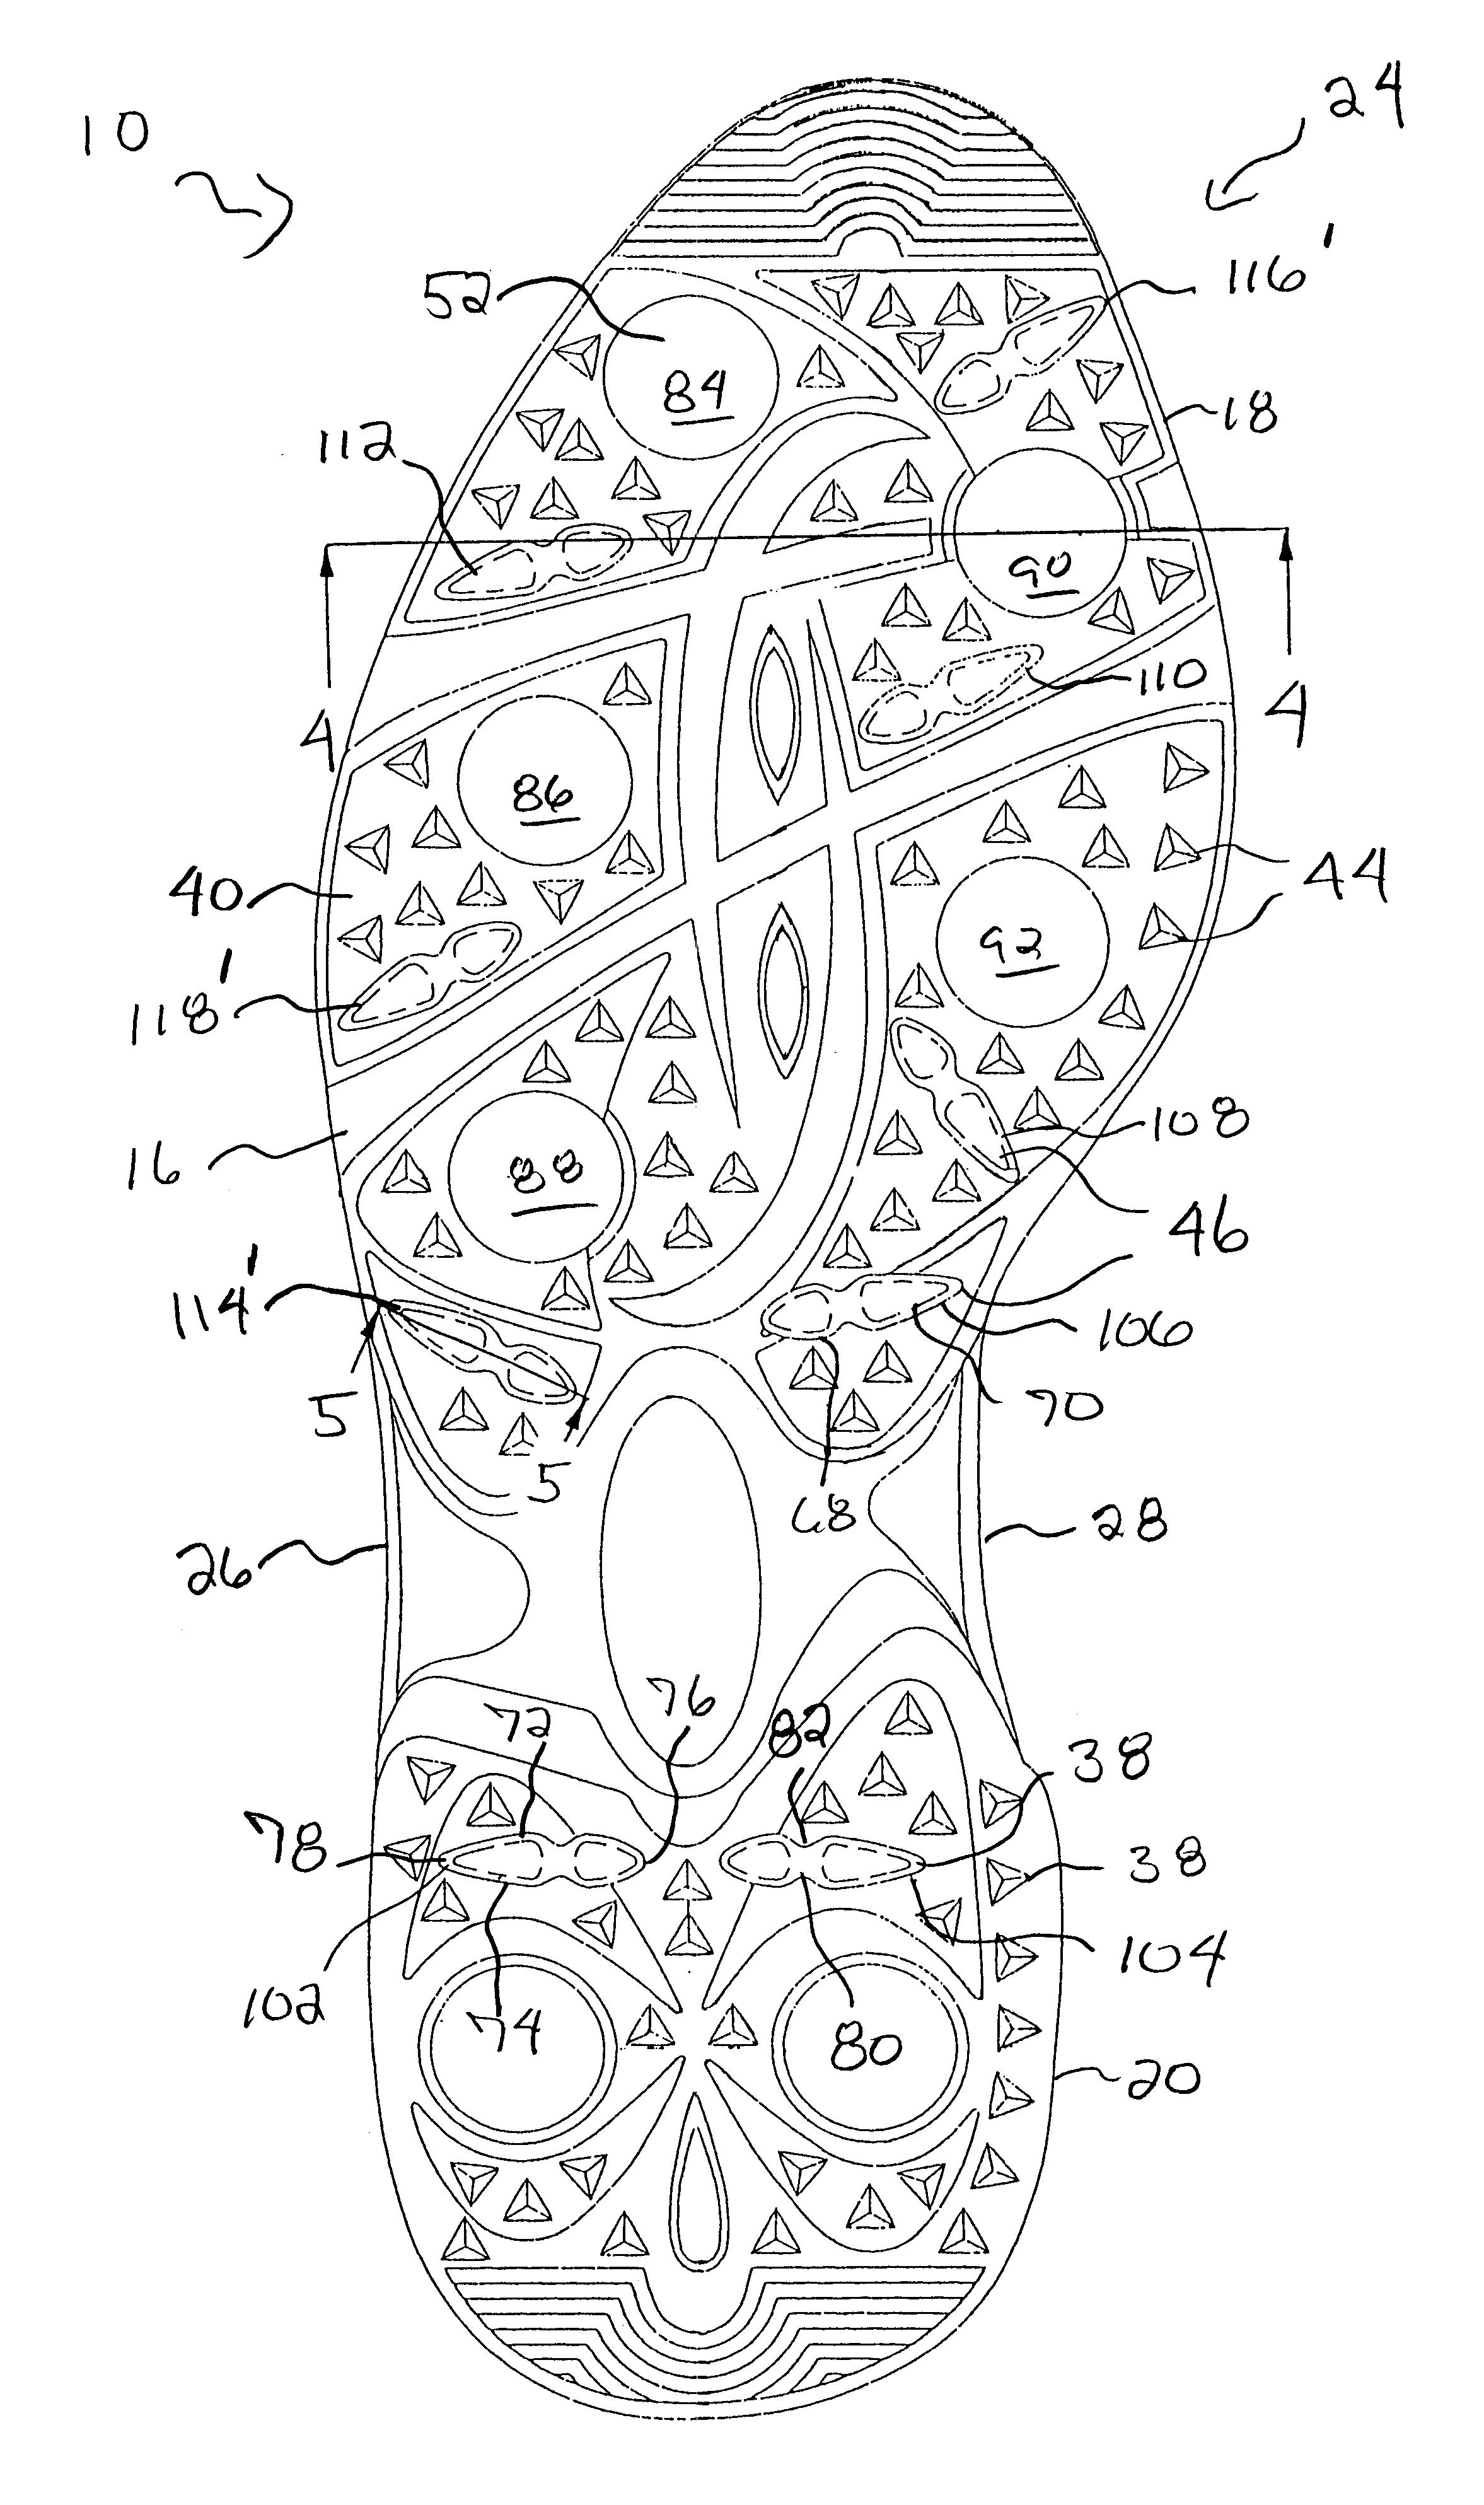 Golf Shoe Patents